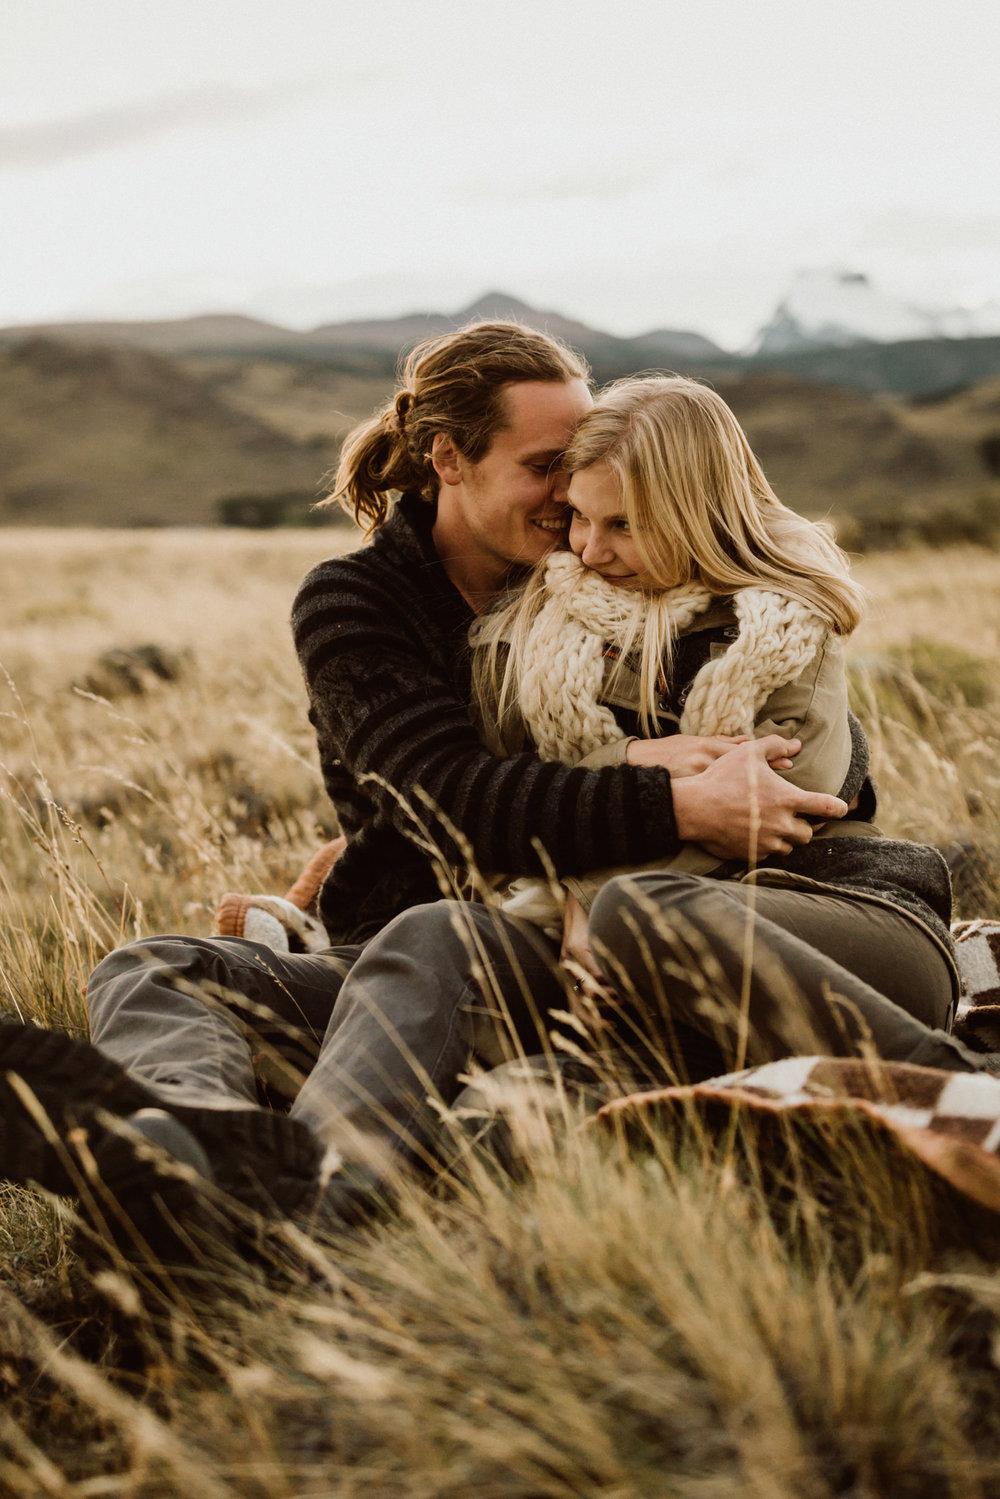 patagonia-wedding-photographer-11.jpg